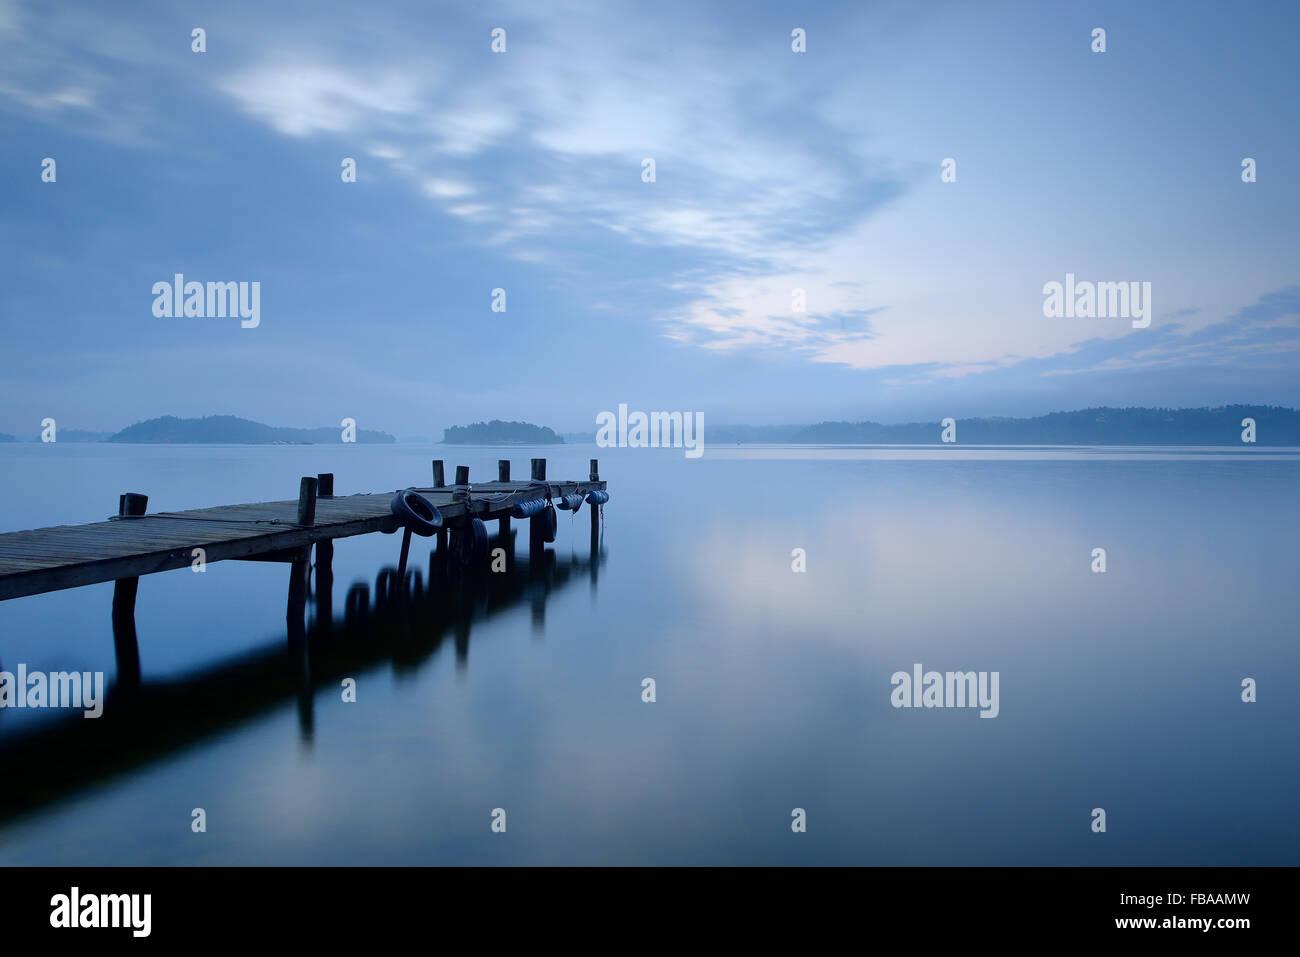 Sweden, Uppland, Stockholm Archipelago, Lidingo, Hoggarnsfjarden, Pier extending into calm bay - Stock Image